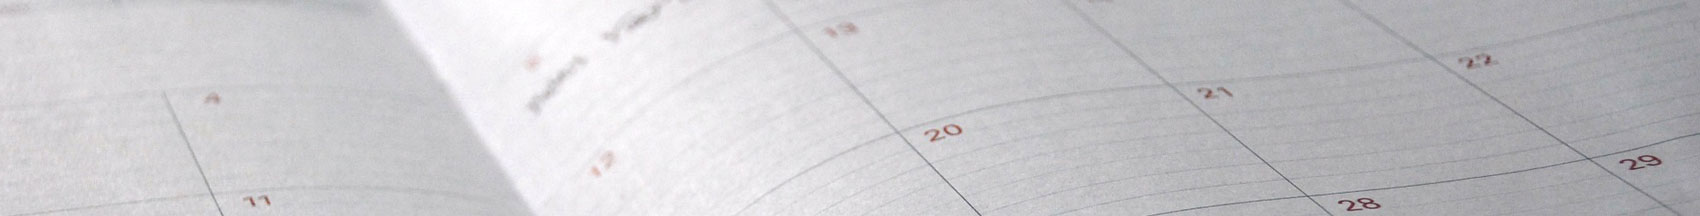 Kalender,Termin buchen